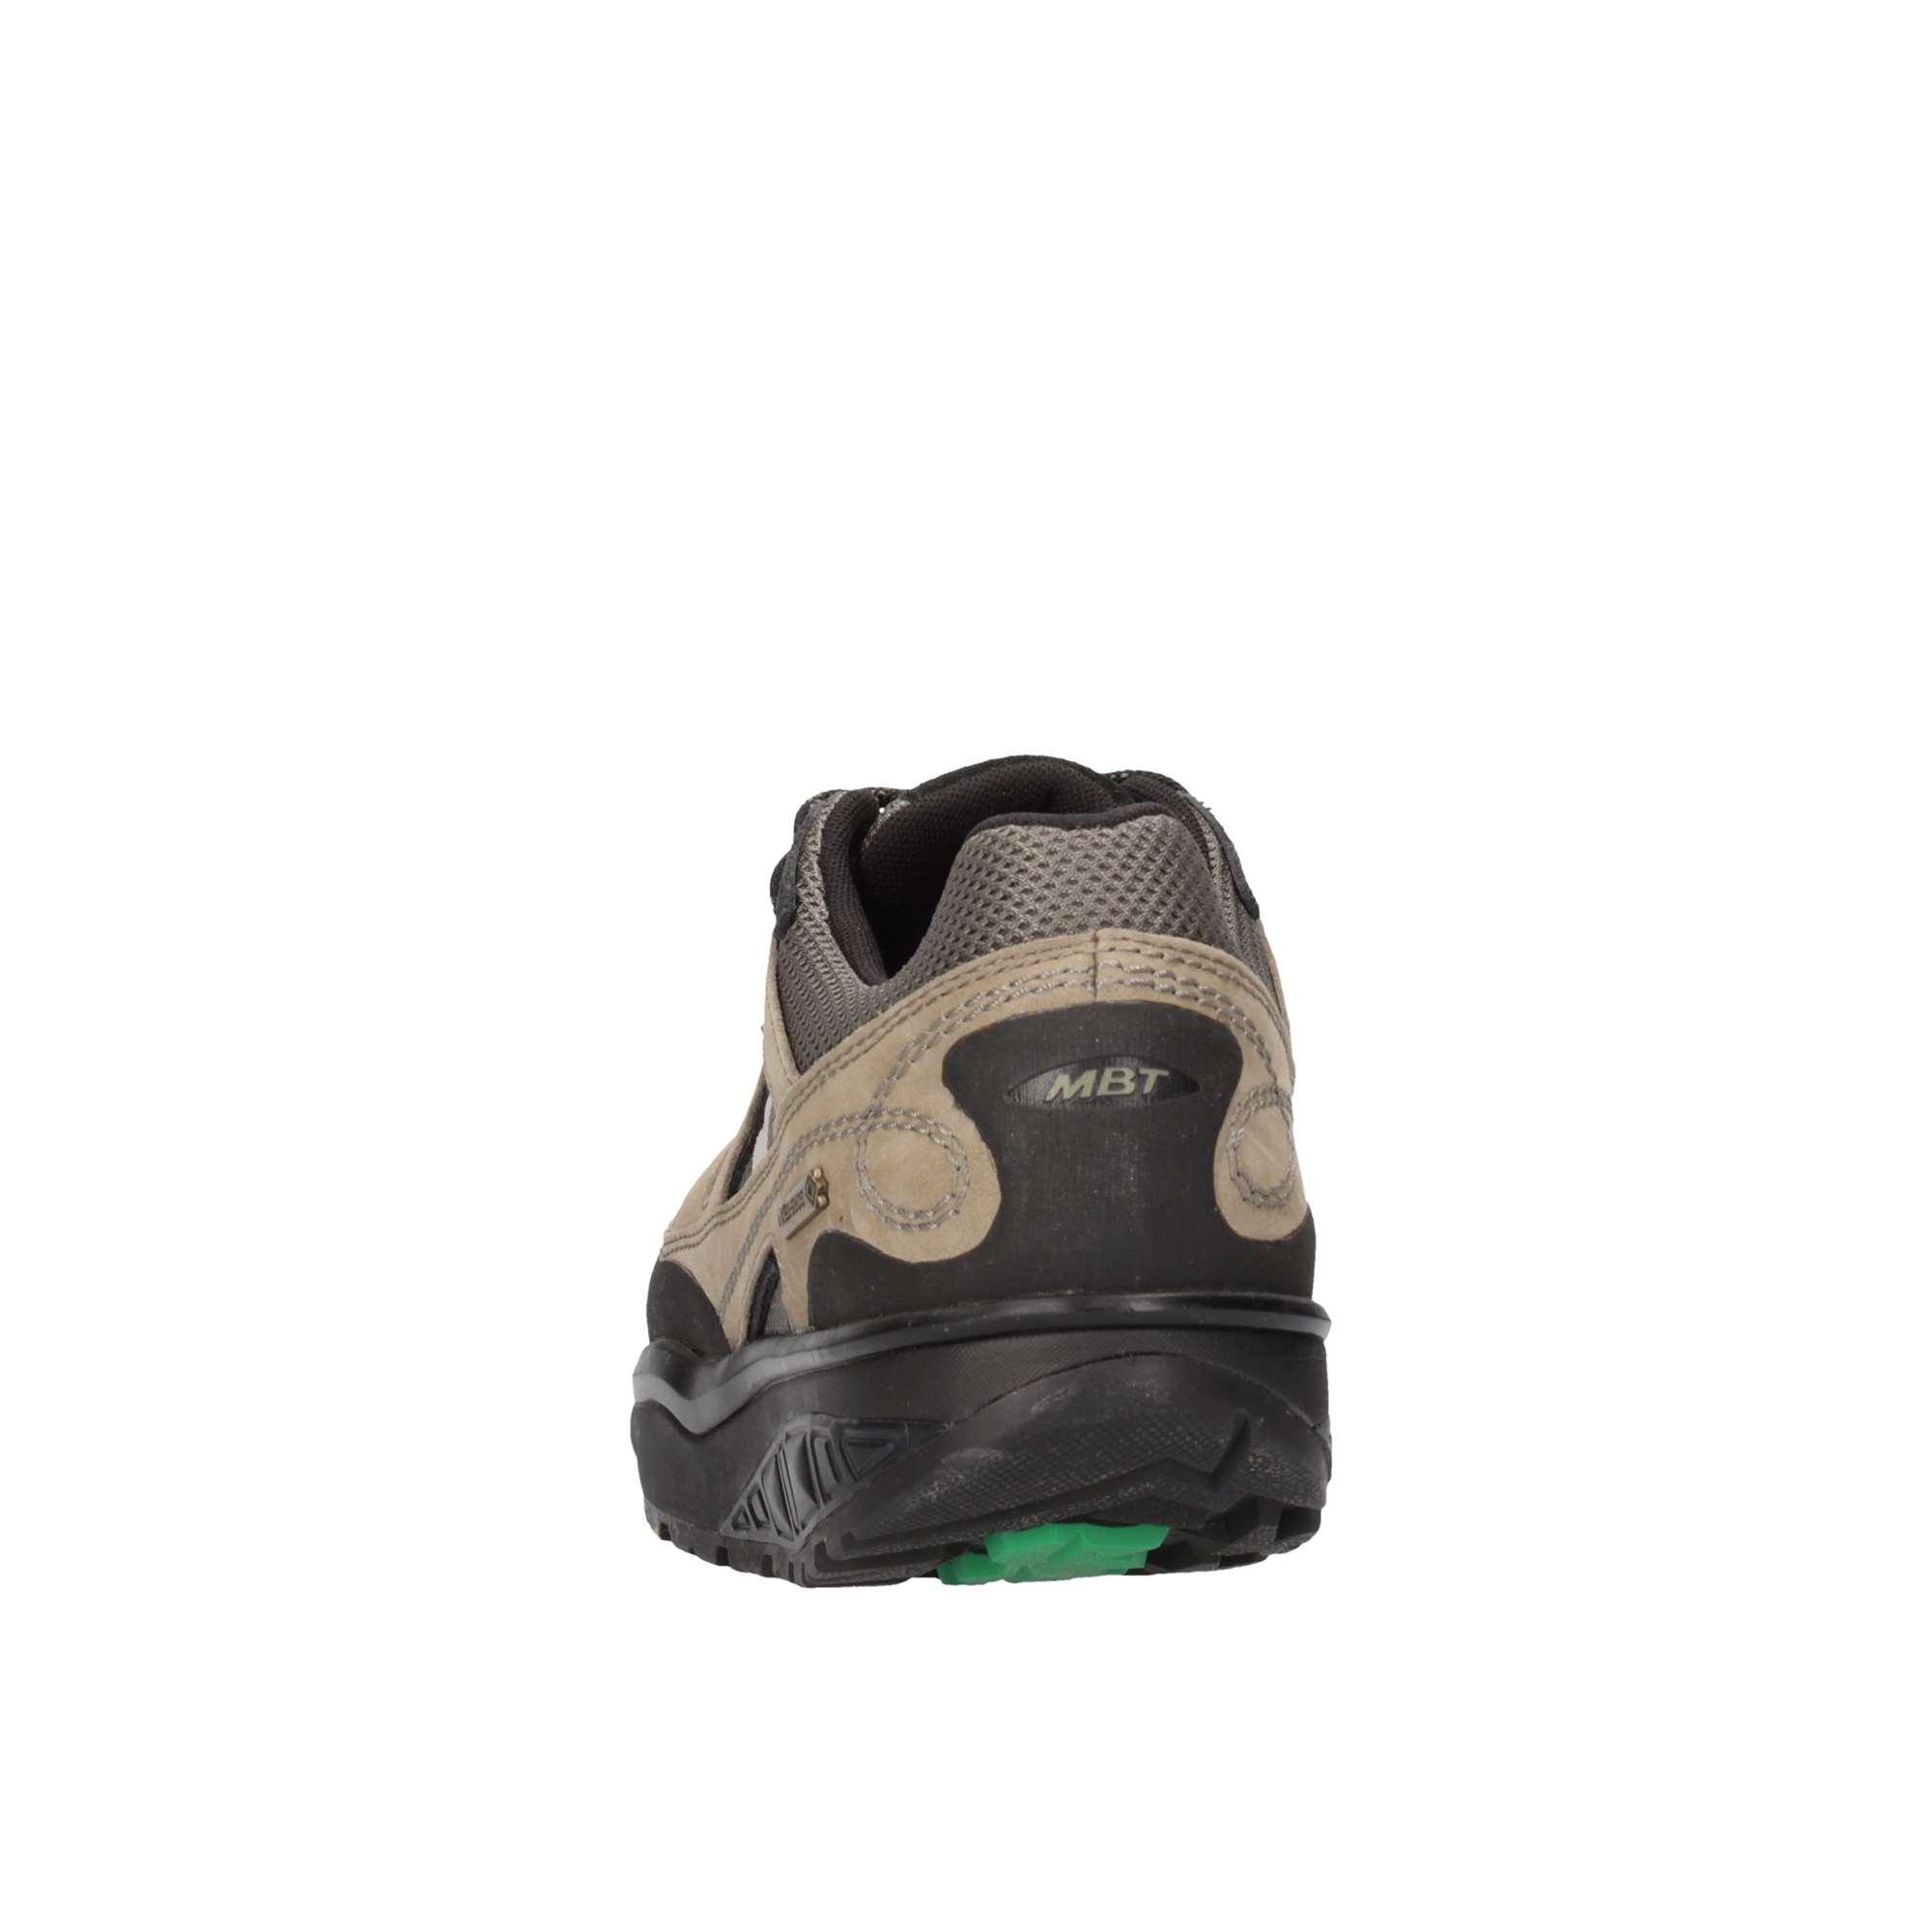 Mbt Hodari Gtx M Oak Green/black Scarpa Uomo [hodog] - 41, Verde/nero